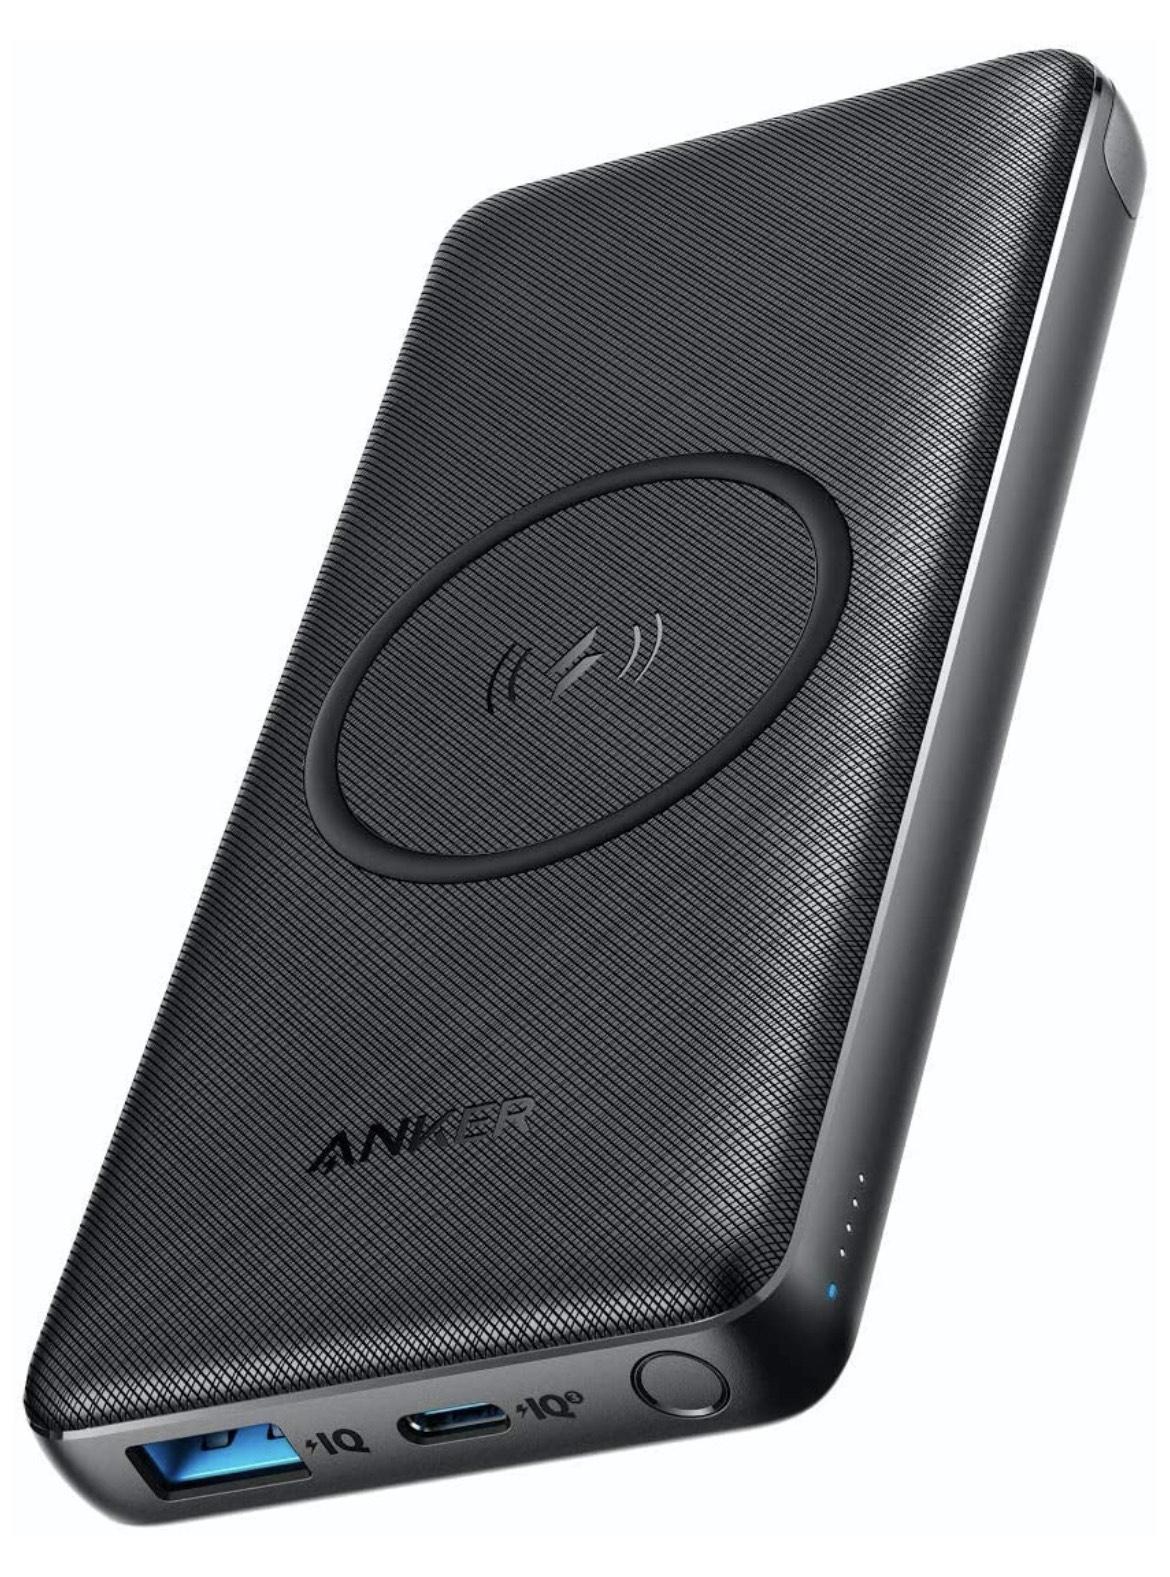 Anker PowerCore III 10K Wireless Powerbank (10000mAh, Qi, 18W QC)